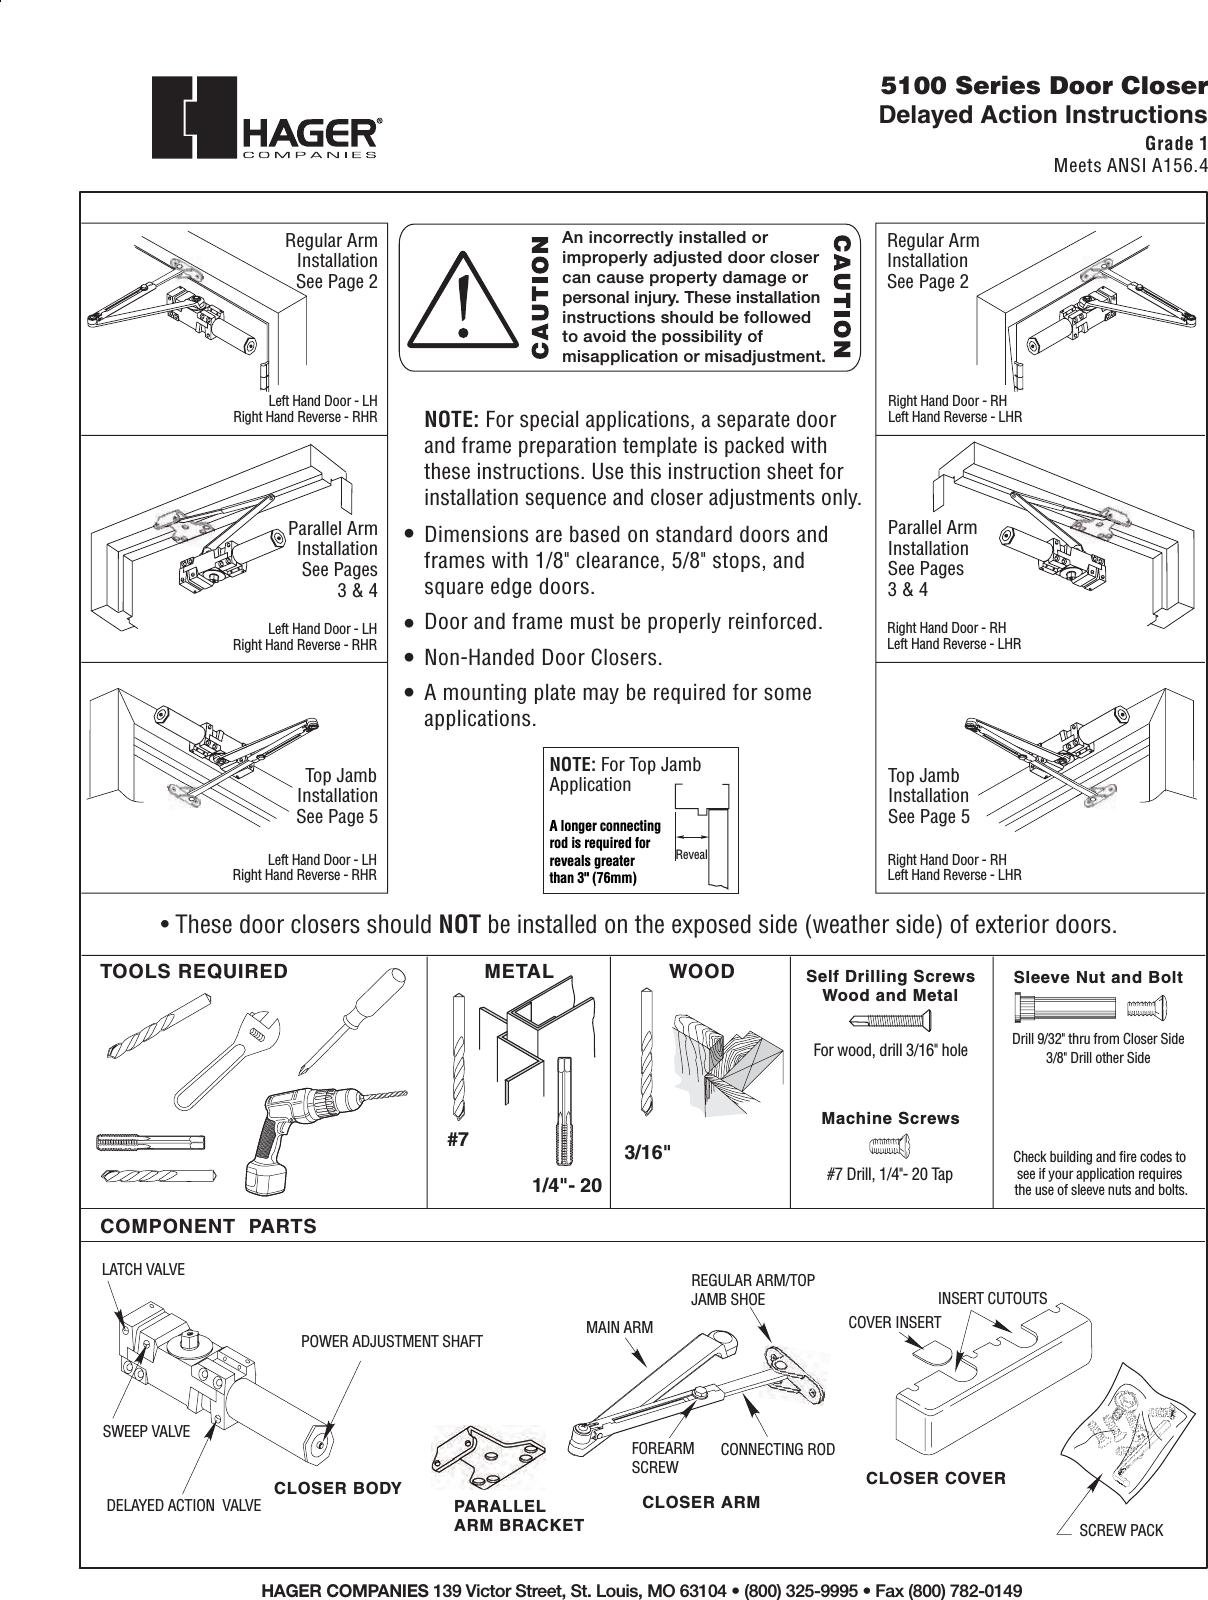 Hager 5100 Delay Install Pgs 06 18 07 5100 Series Door Manual Guide